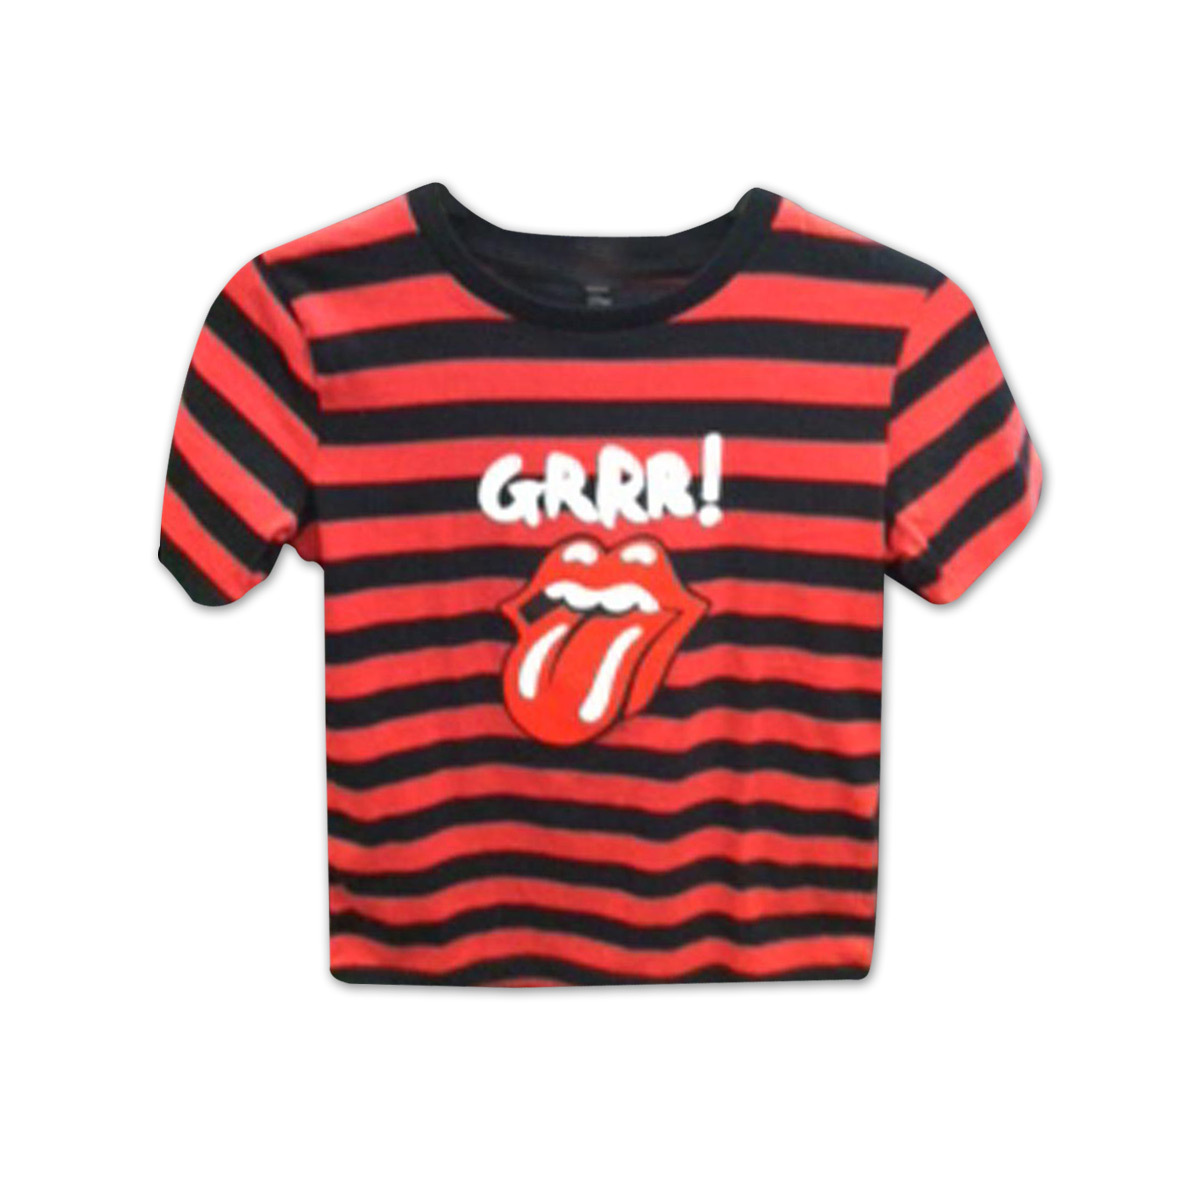 Rolling Stones GRRR! Baby Stripes